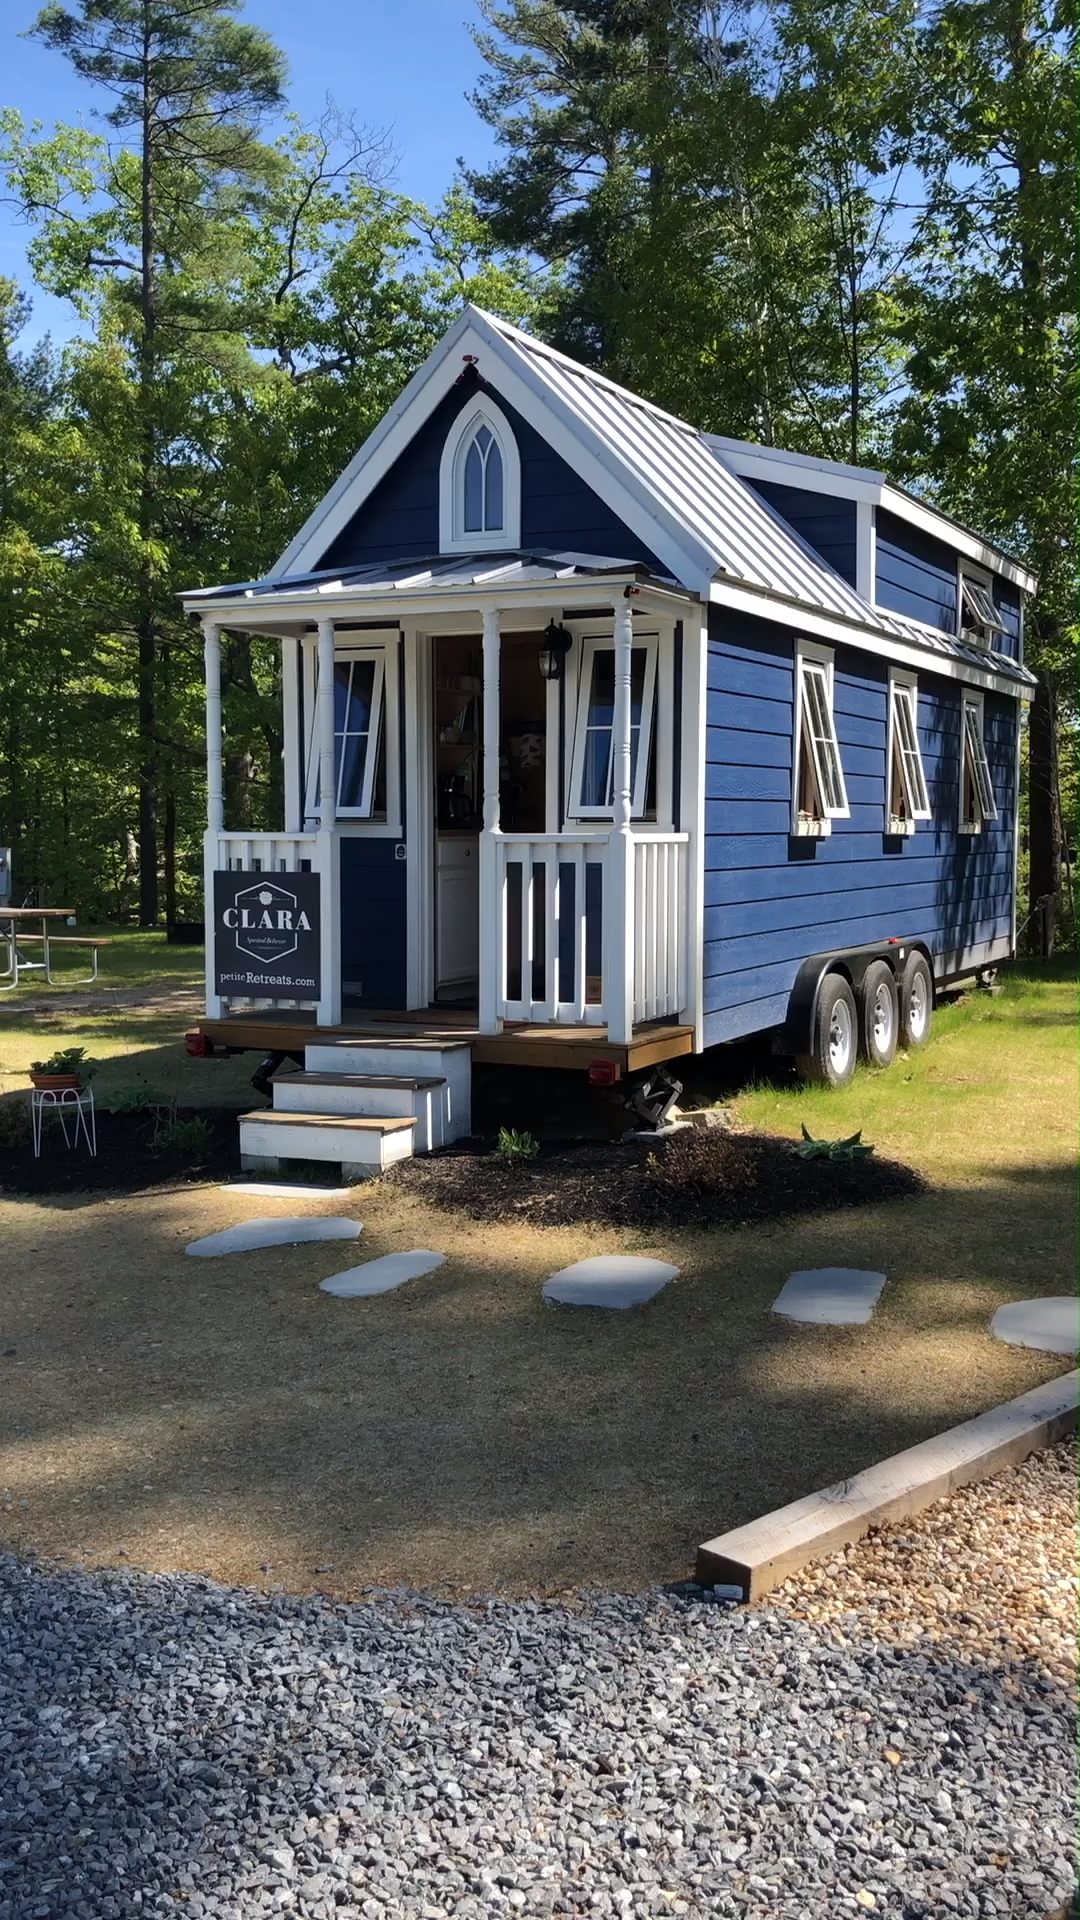 Tiny House Tour of Clara Tiny Home on Wheels! #tinyhouses